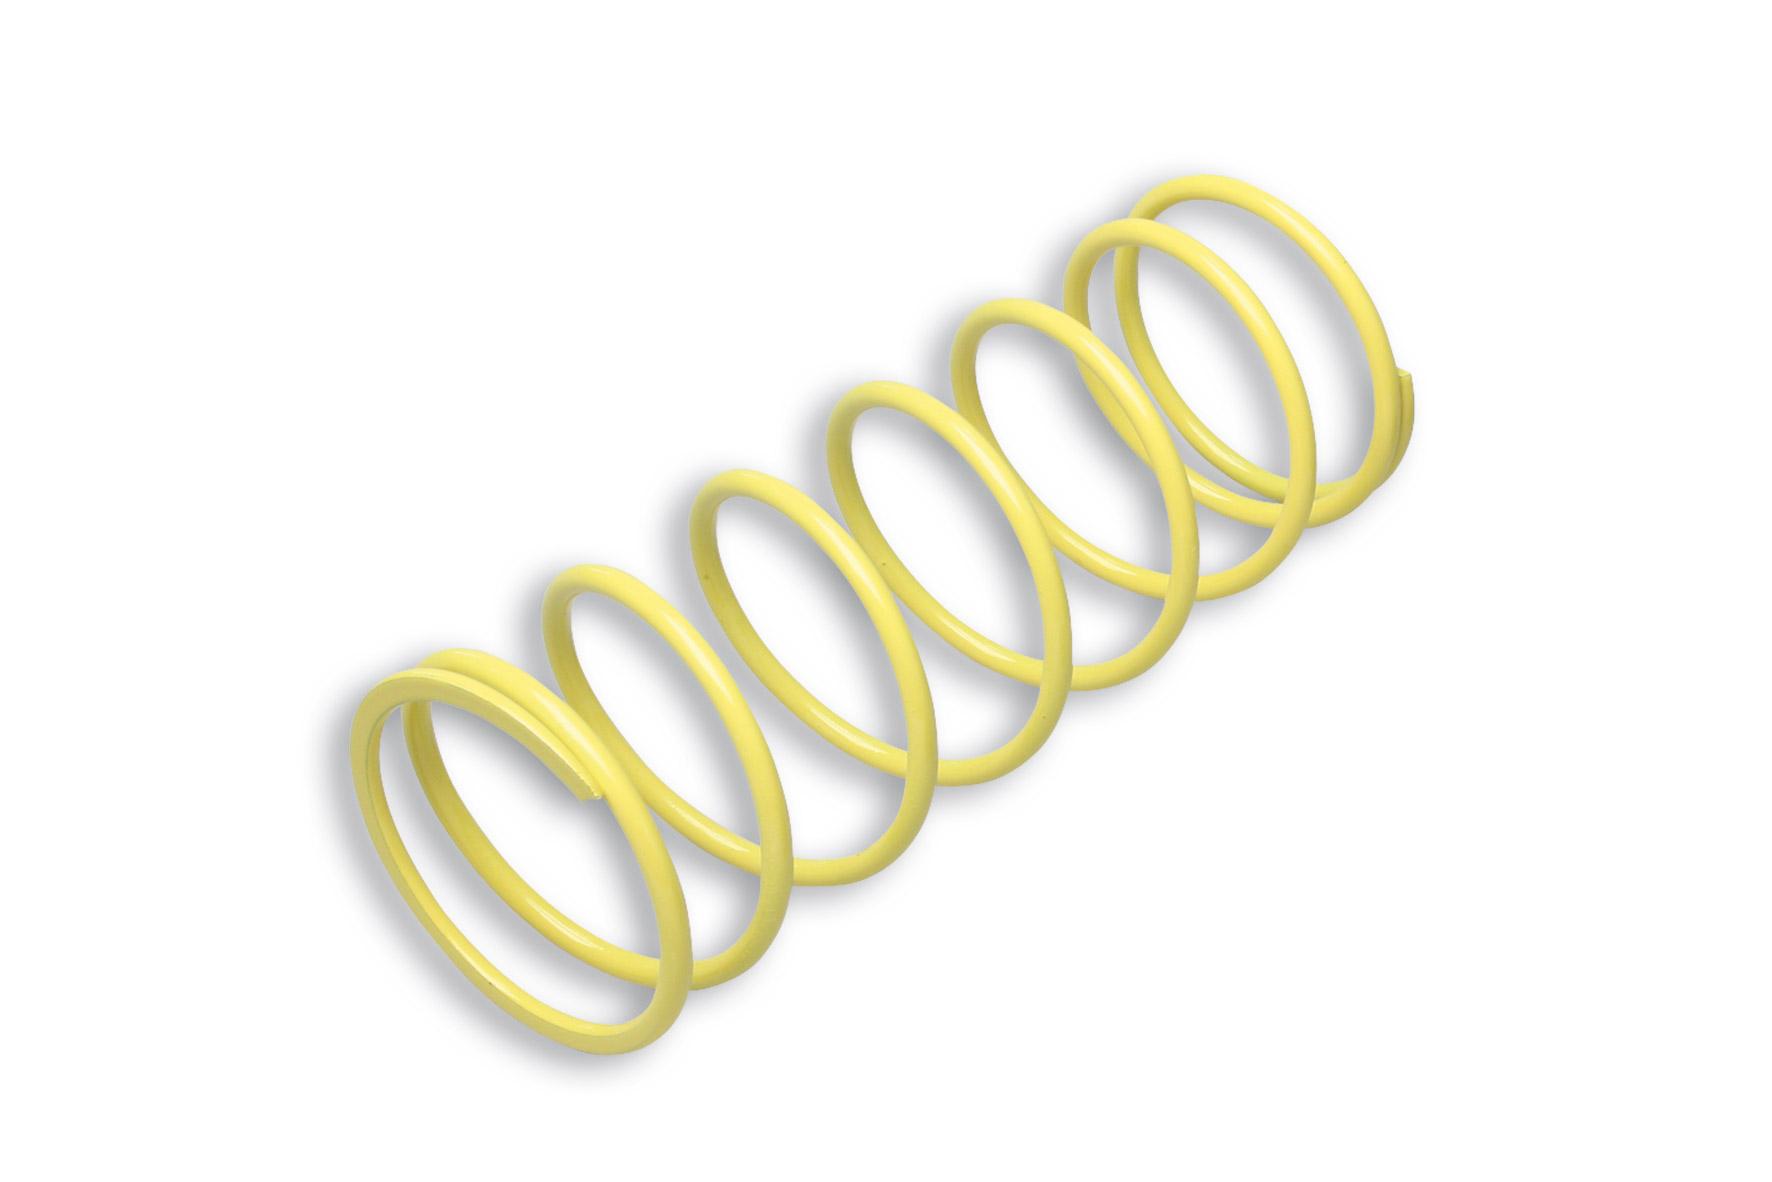 YELLOW VARIATOR ADJUSTER SPRING ext.Ø 67,2x181mm thread Ø 4,7mm 3,6k